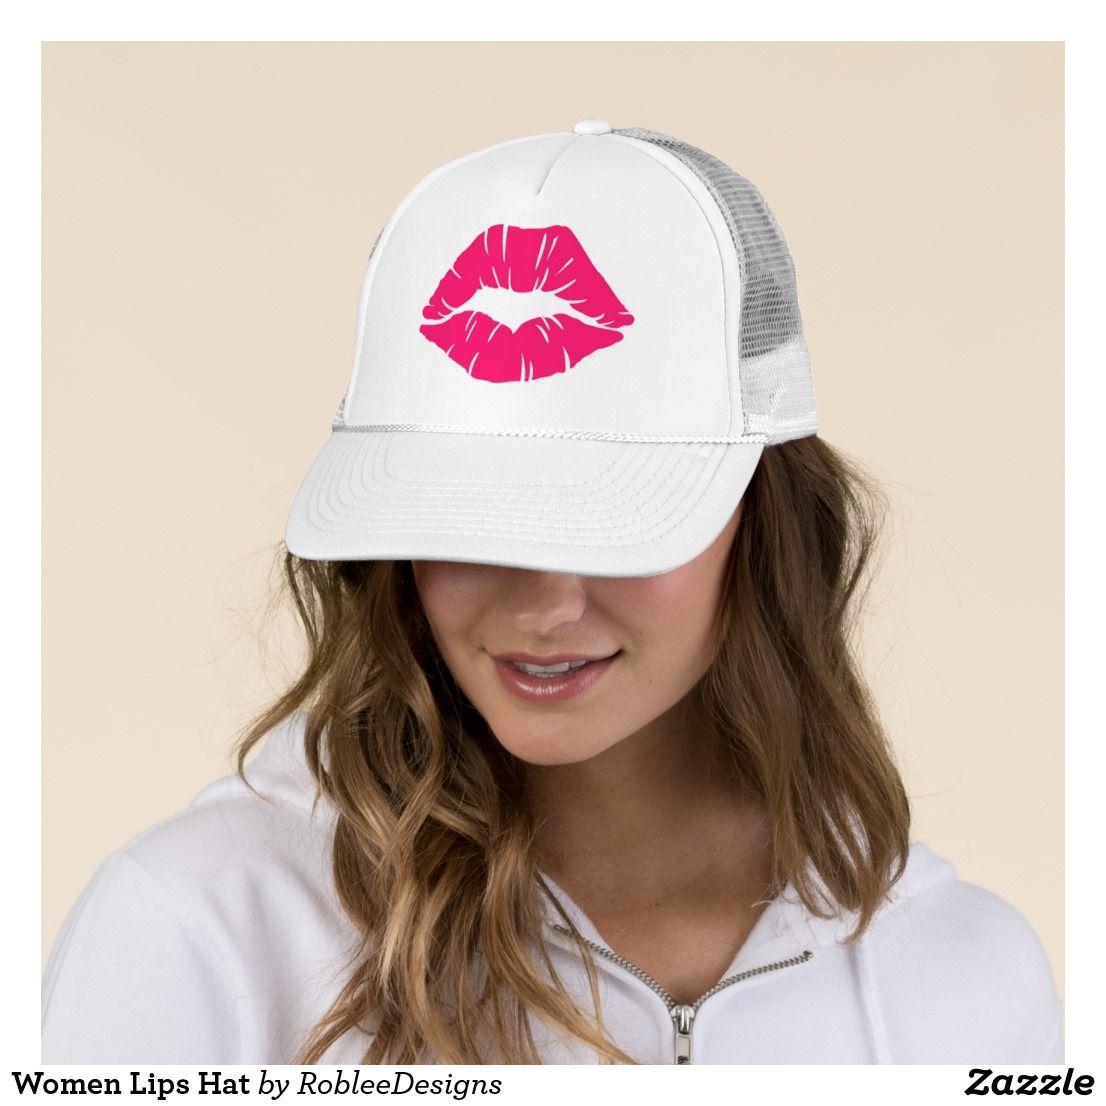 869616be2f6 Women Lips Hat  16.95  cap  hats  hat  lips  fashion  style  apparel   womensfashion  women  shopping  shop  cute  love  sweet  woman   Saturdaymorning  new ...